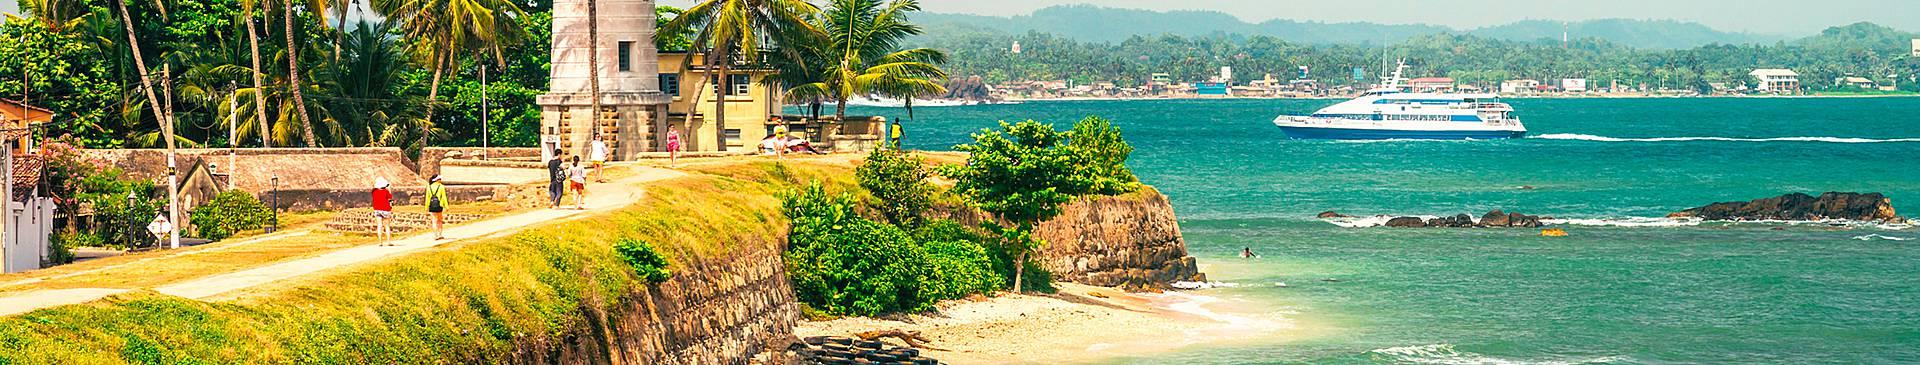 Strand und Meer Sri Lanka Reisen